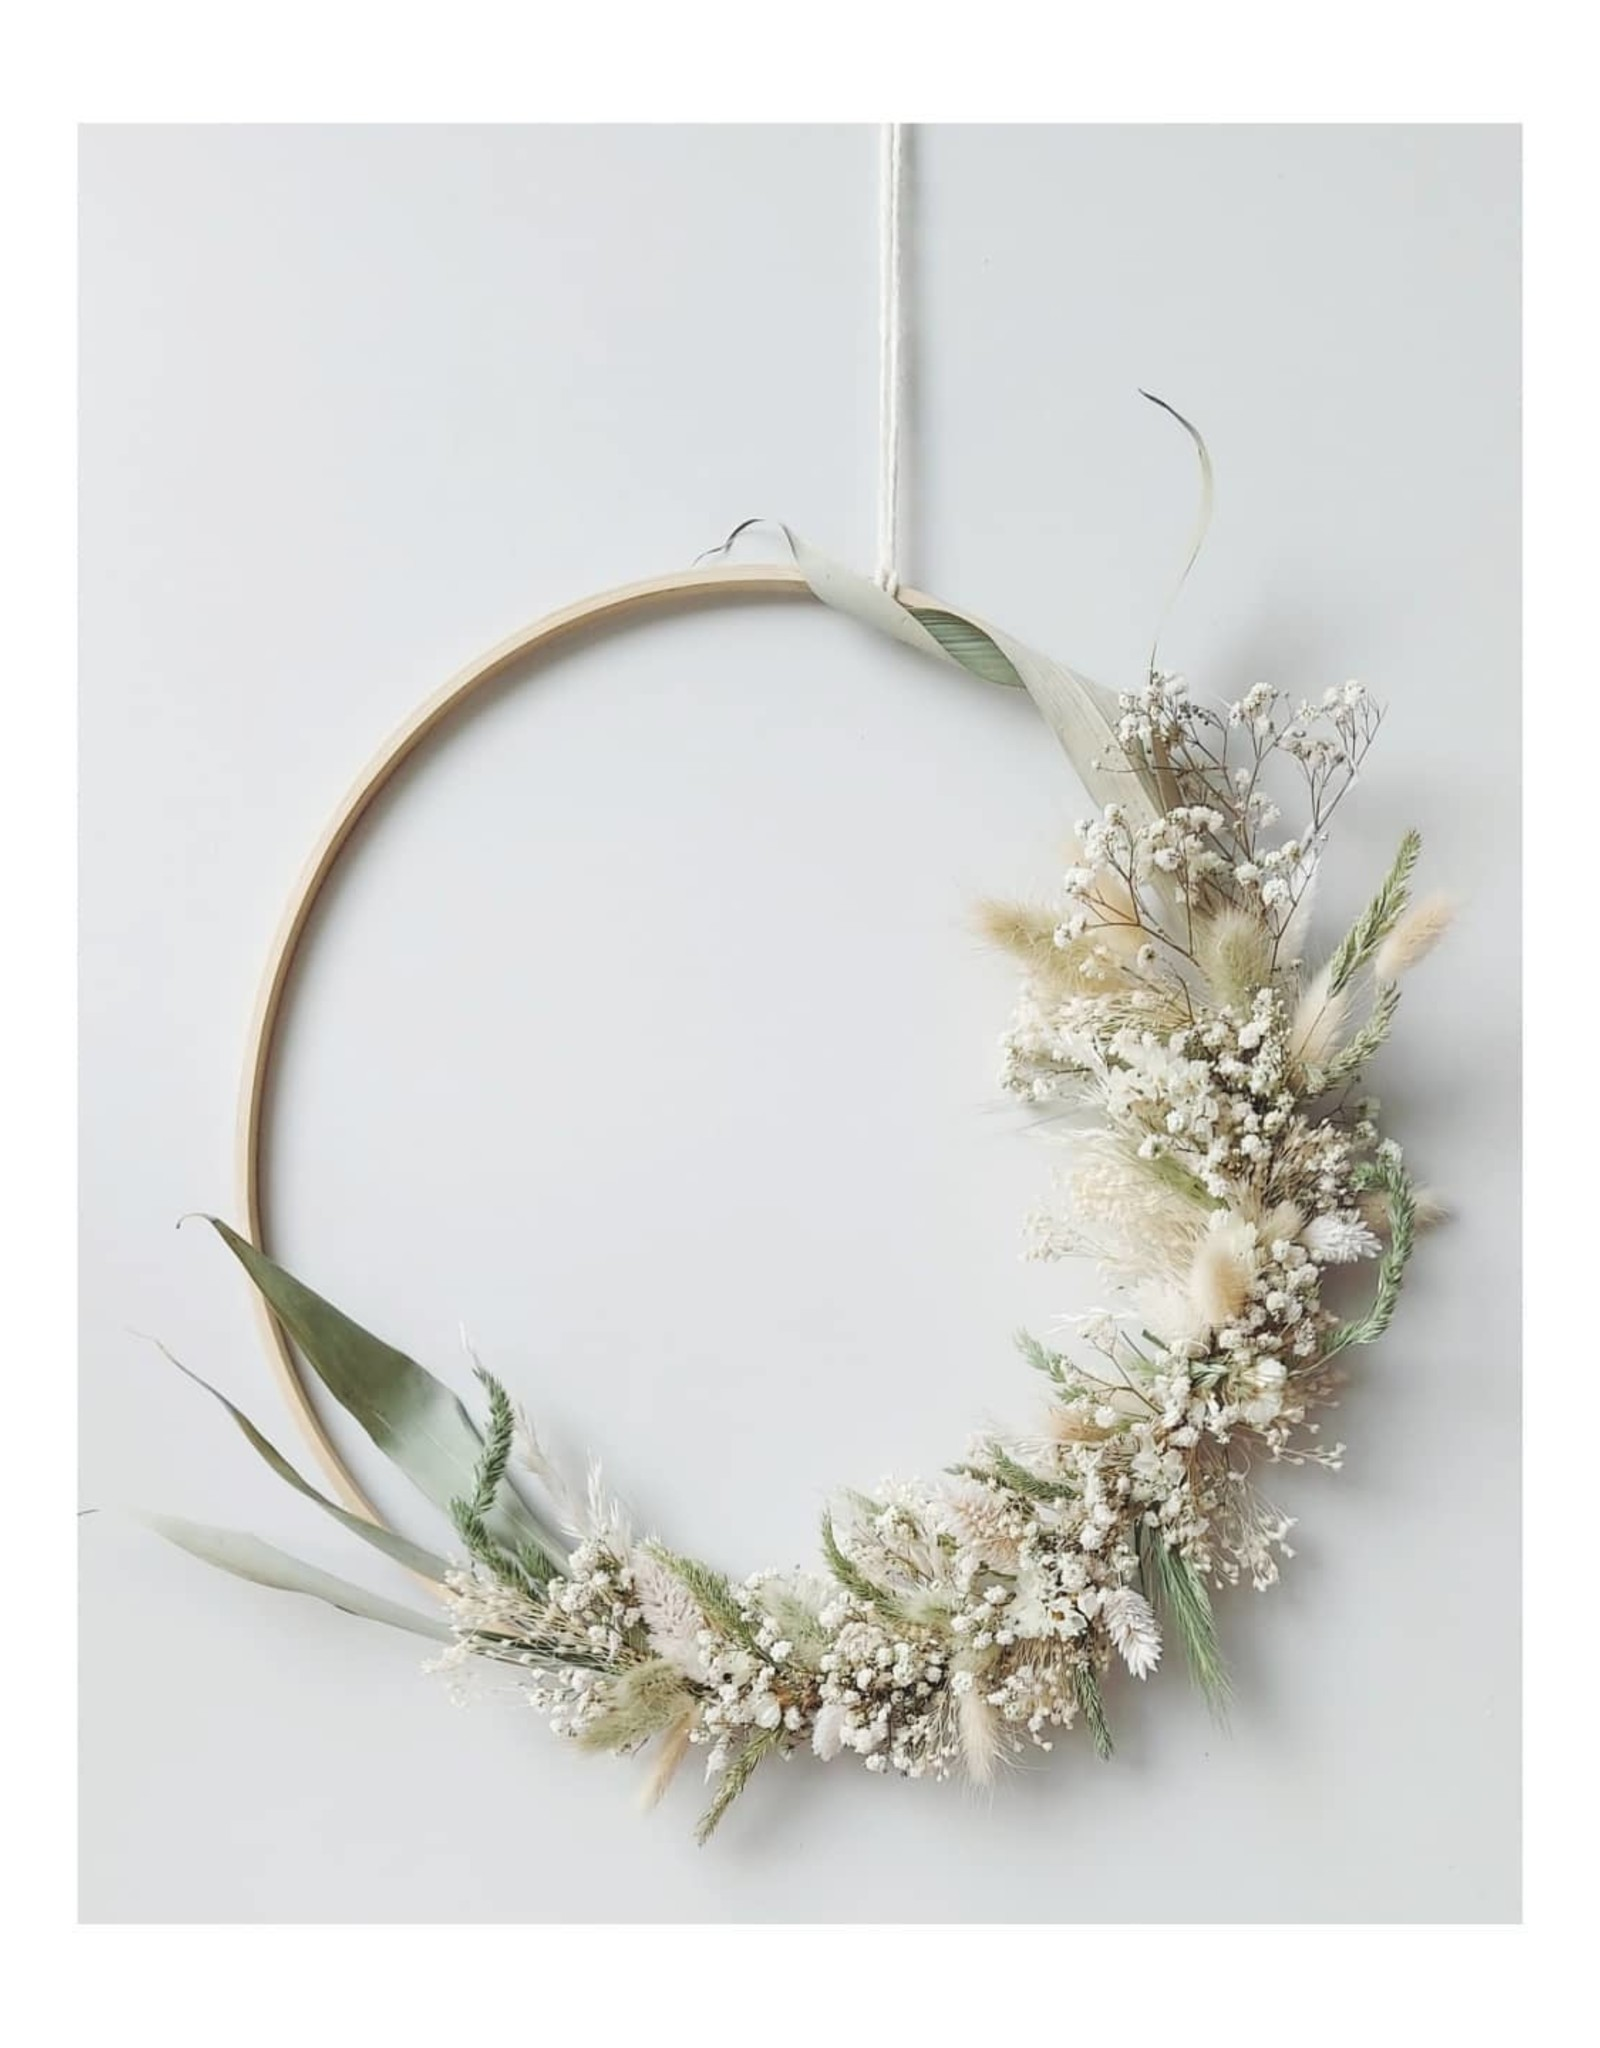 ConceptK 29/10: Floral Hoop